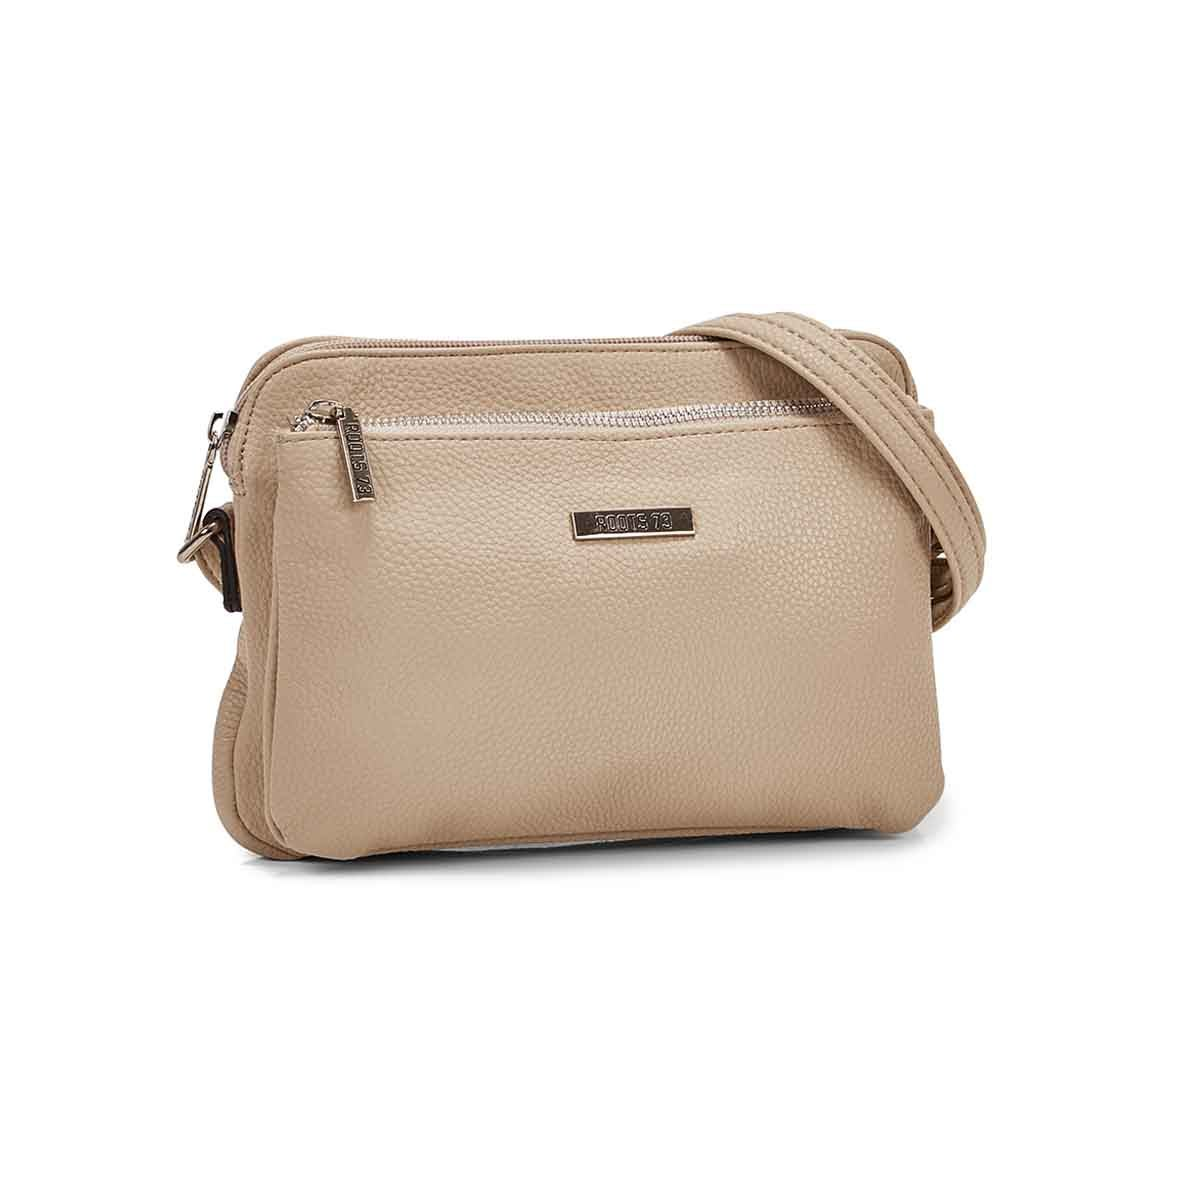 Women's R5200 EAST/WEST stone crossbody bag